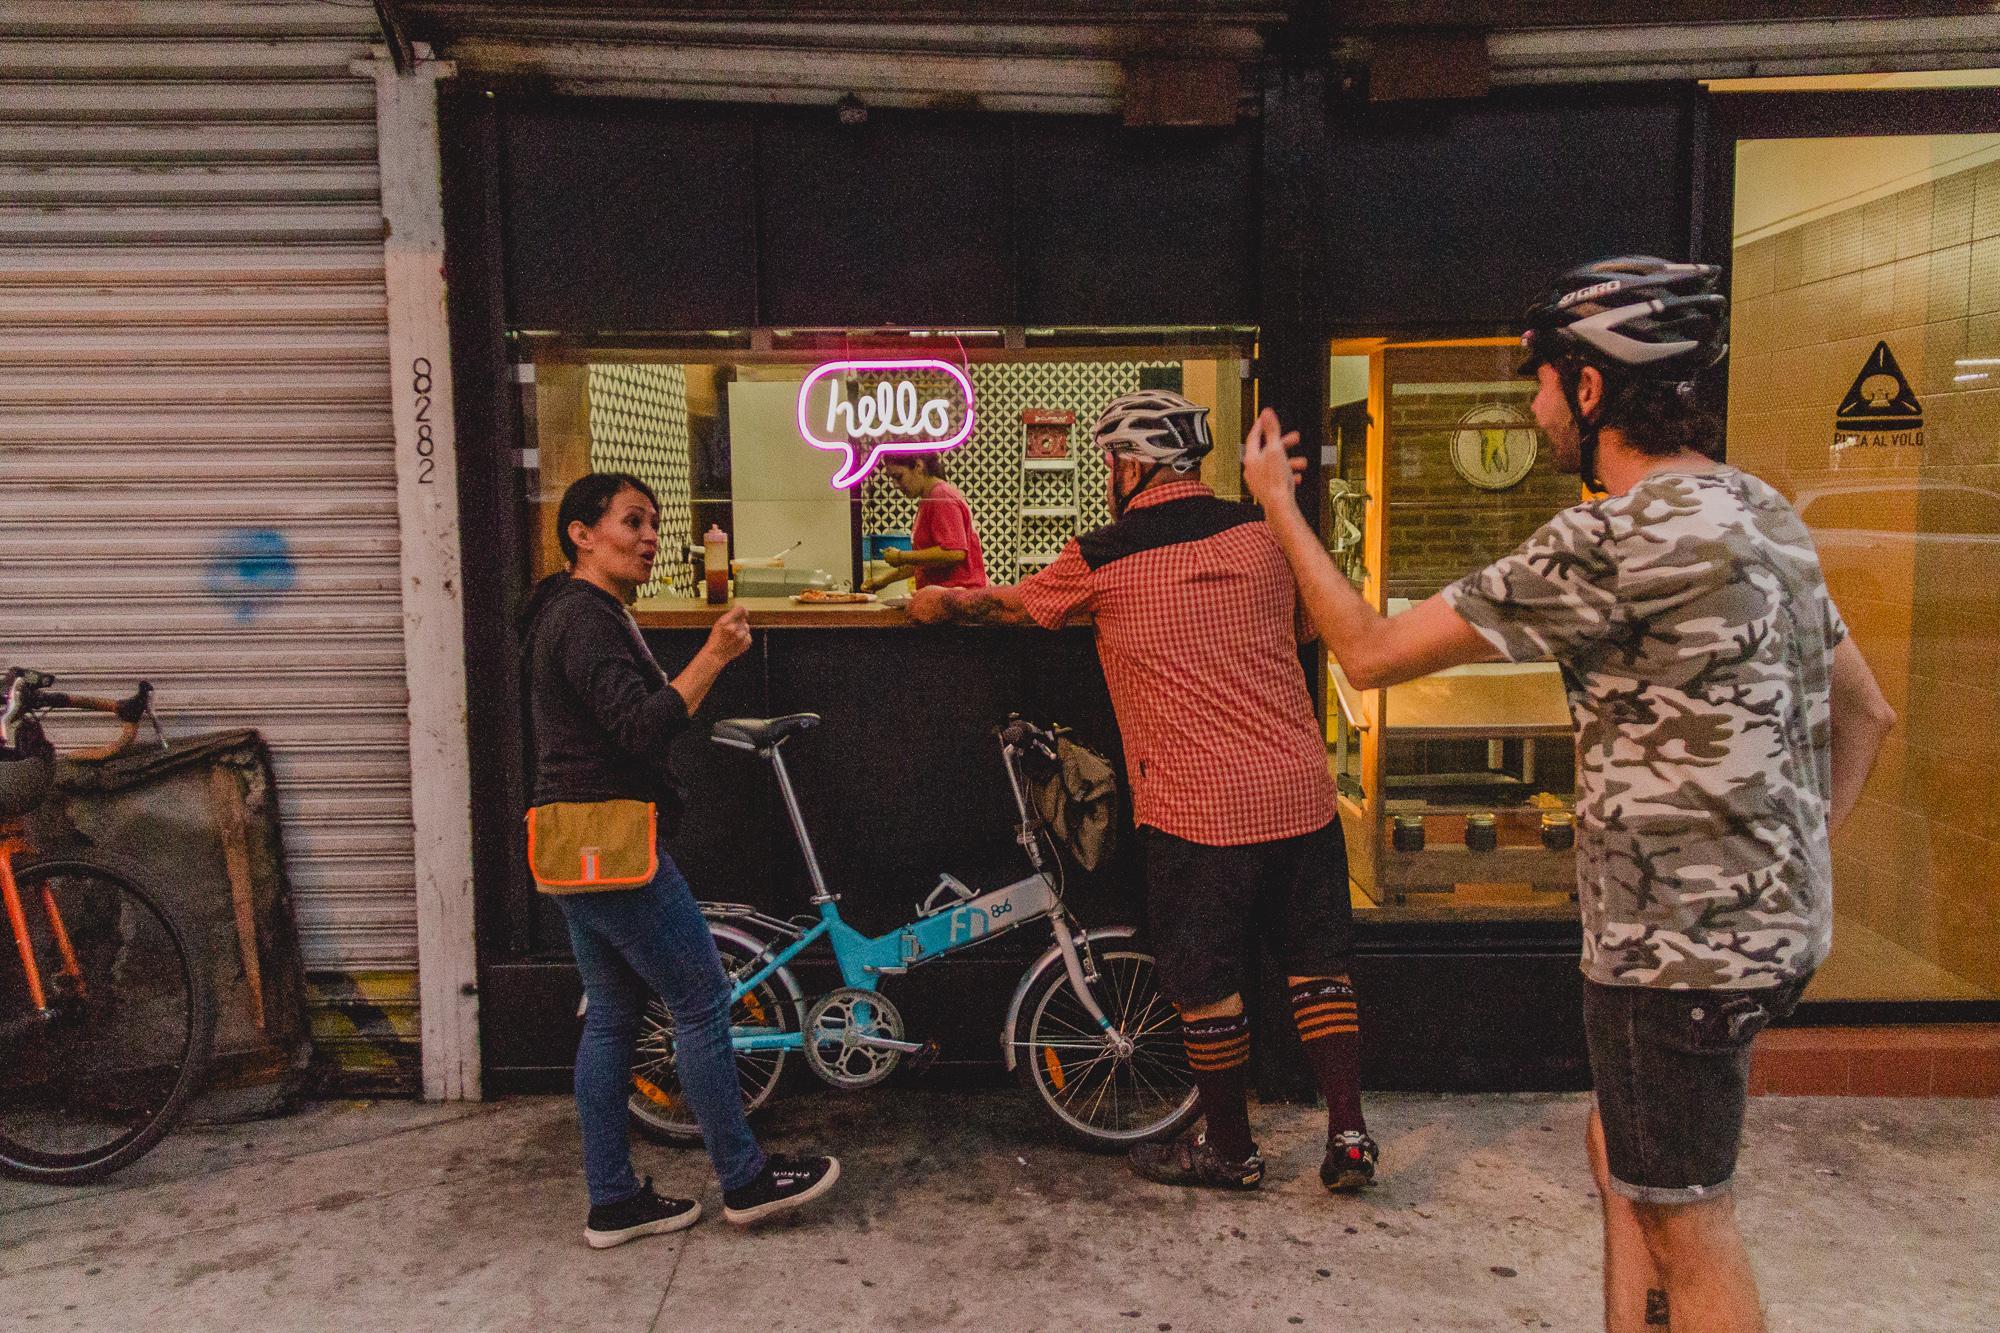 19. Hungry cyclists_